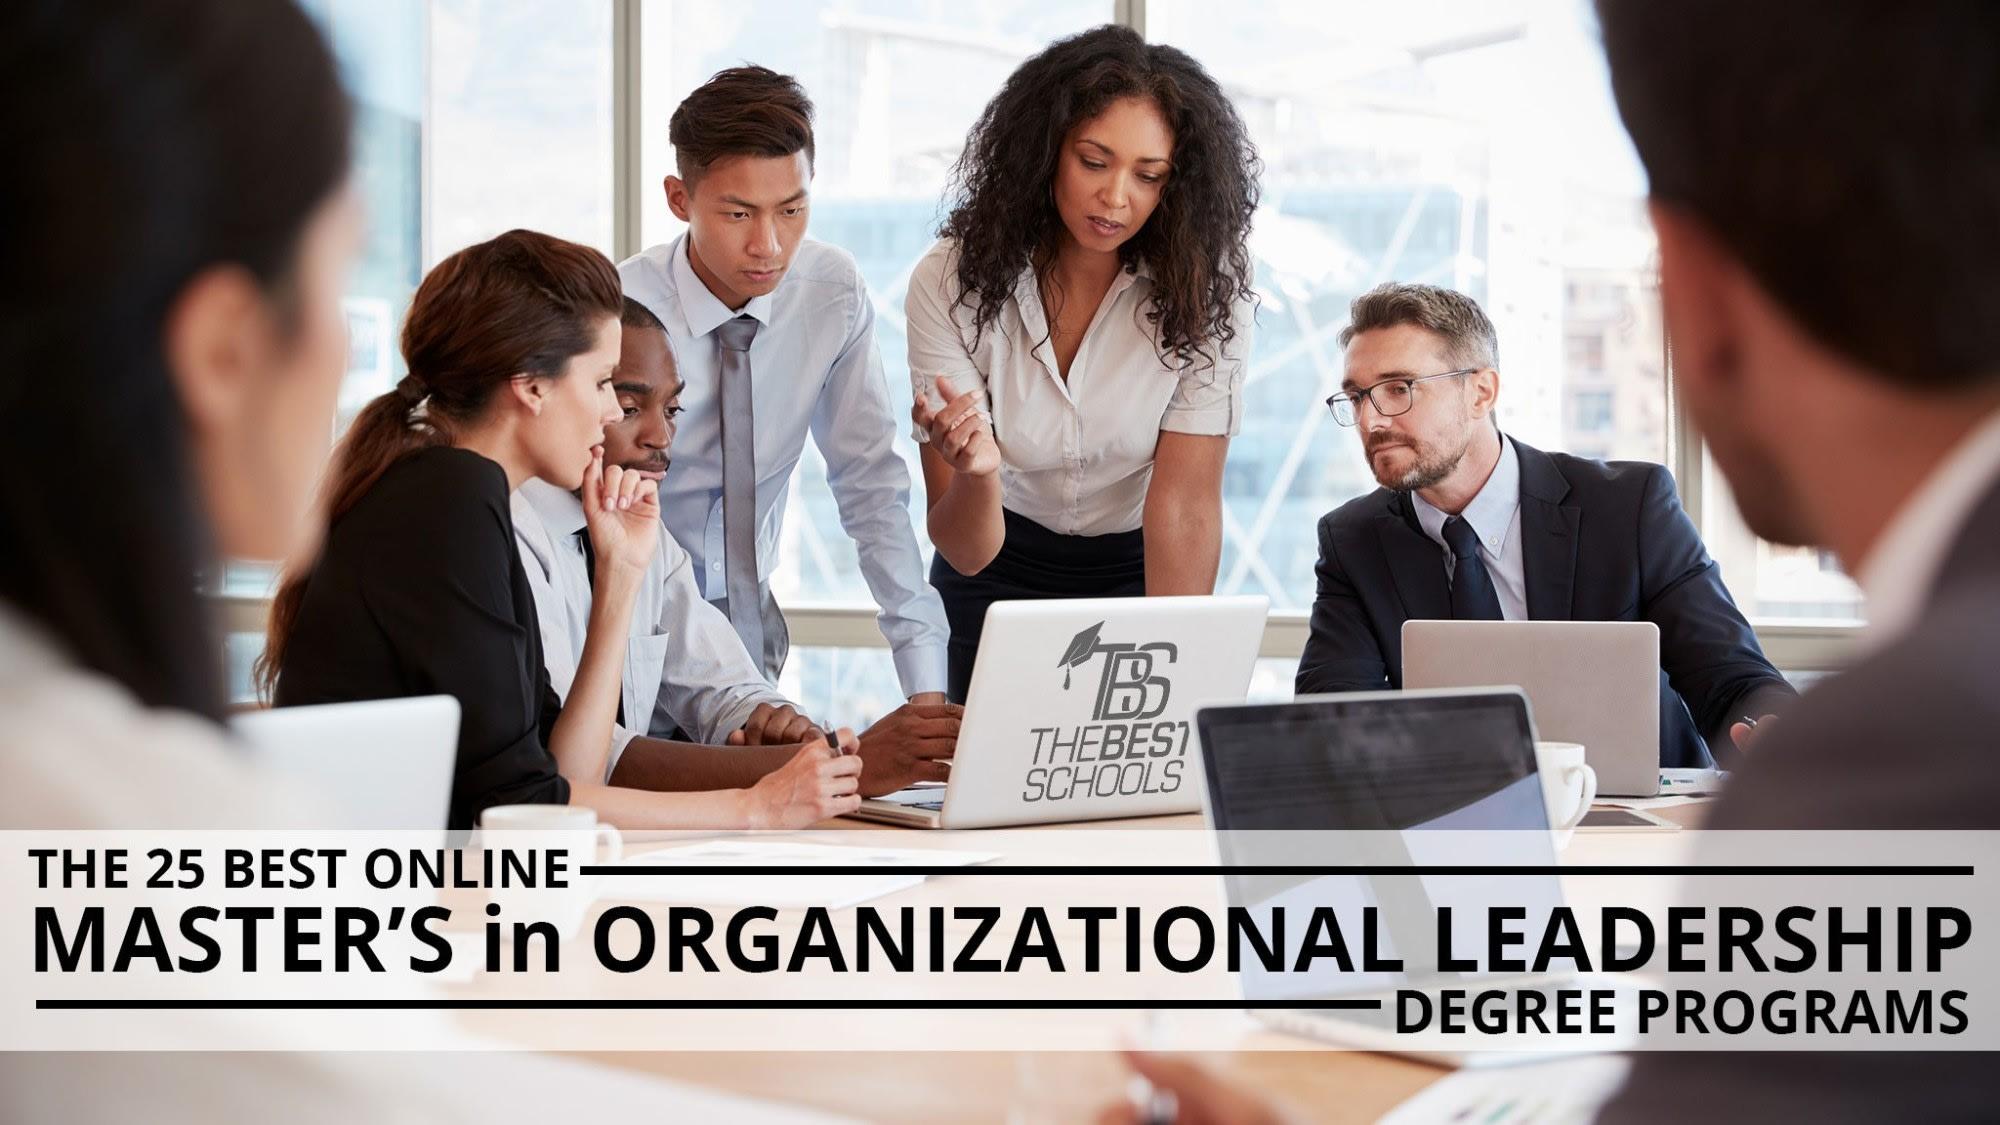 The 25 Best Online Masters In Organizational Leadership Degree Programs